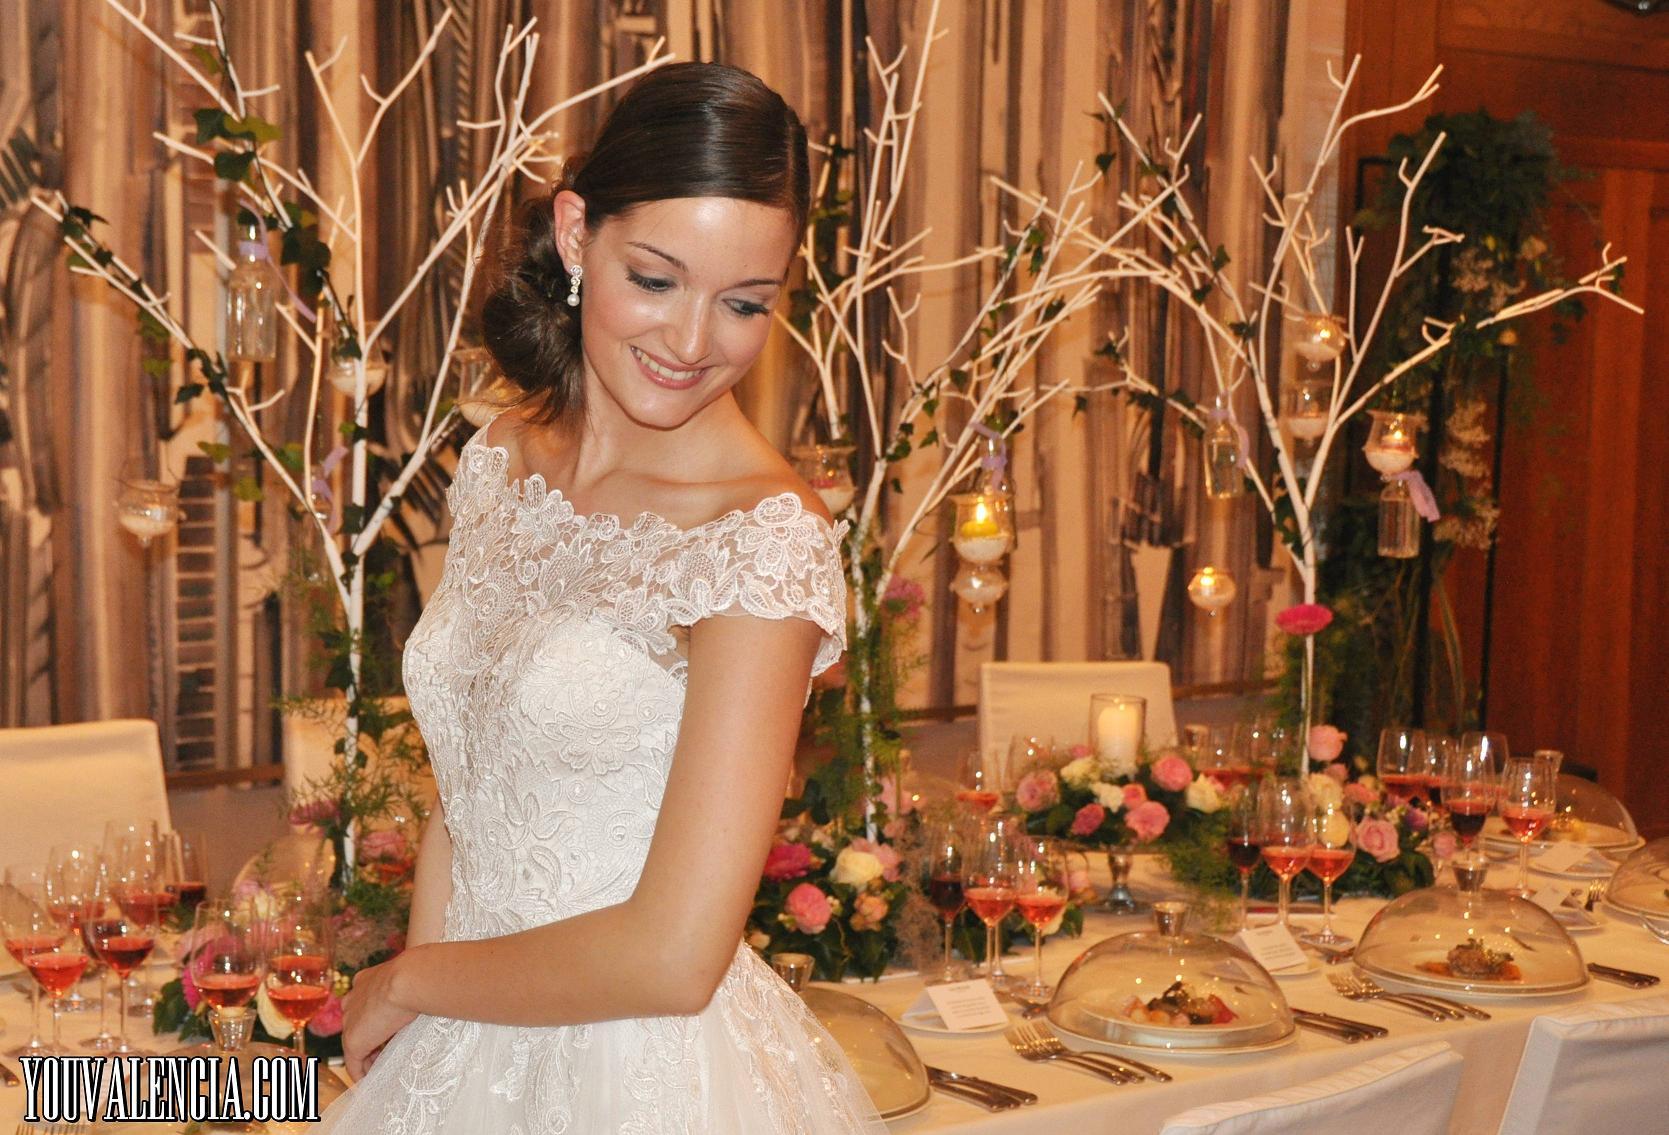 Celebra tu boda perfecta con love wtn autumn 2015 - Tu boda perfecta ...